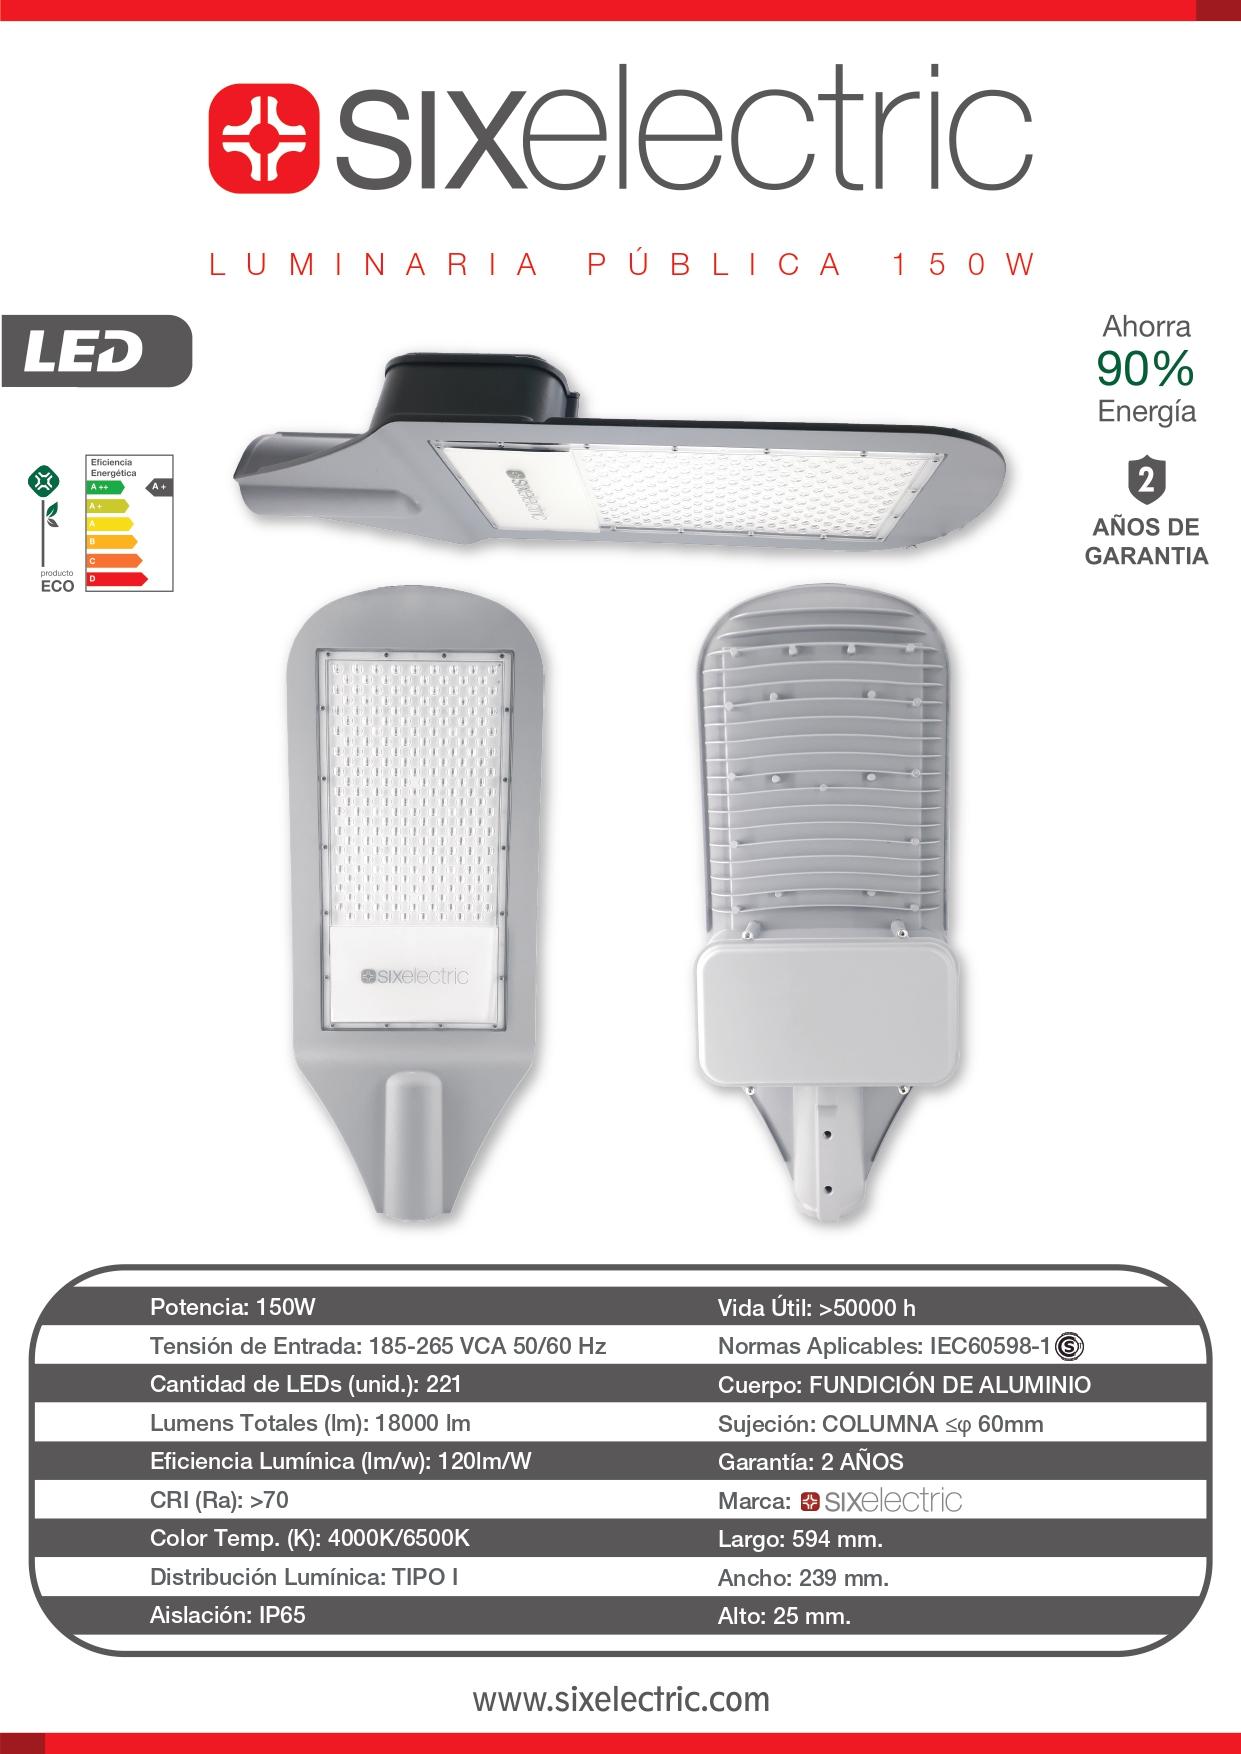 http://www.sixelectric.com/Imagenes/Ficha_tcnica_-_Luminara_de_alumbrado_pblico_-_150w_page-0001.jpg